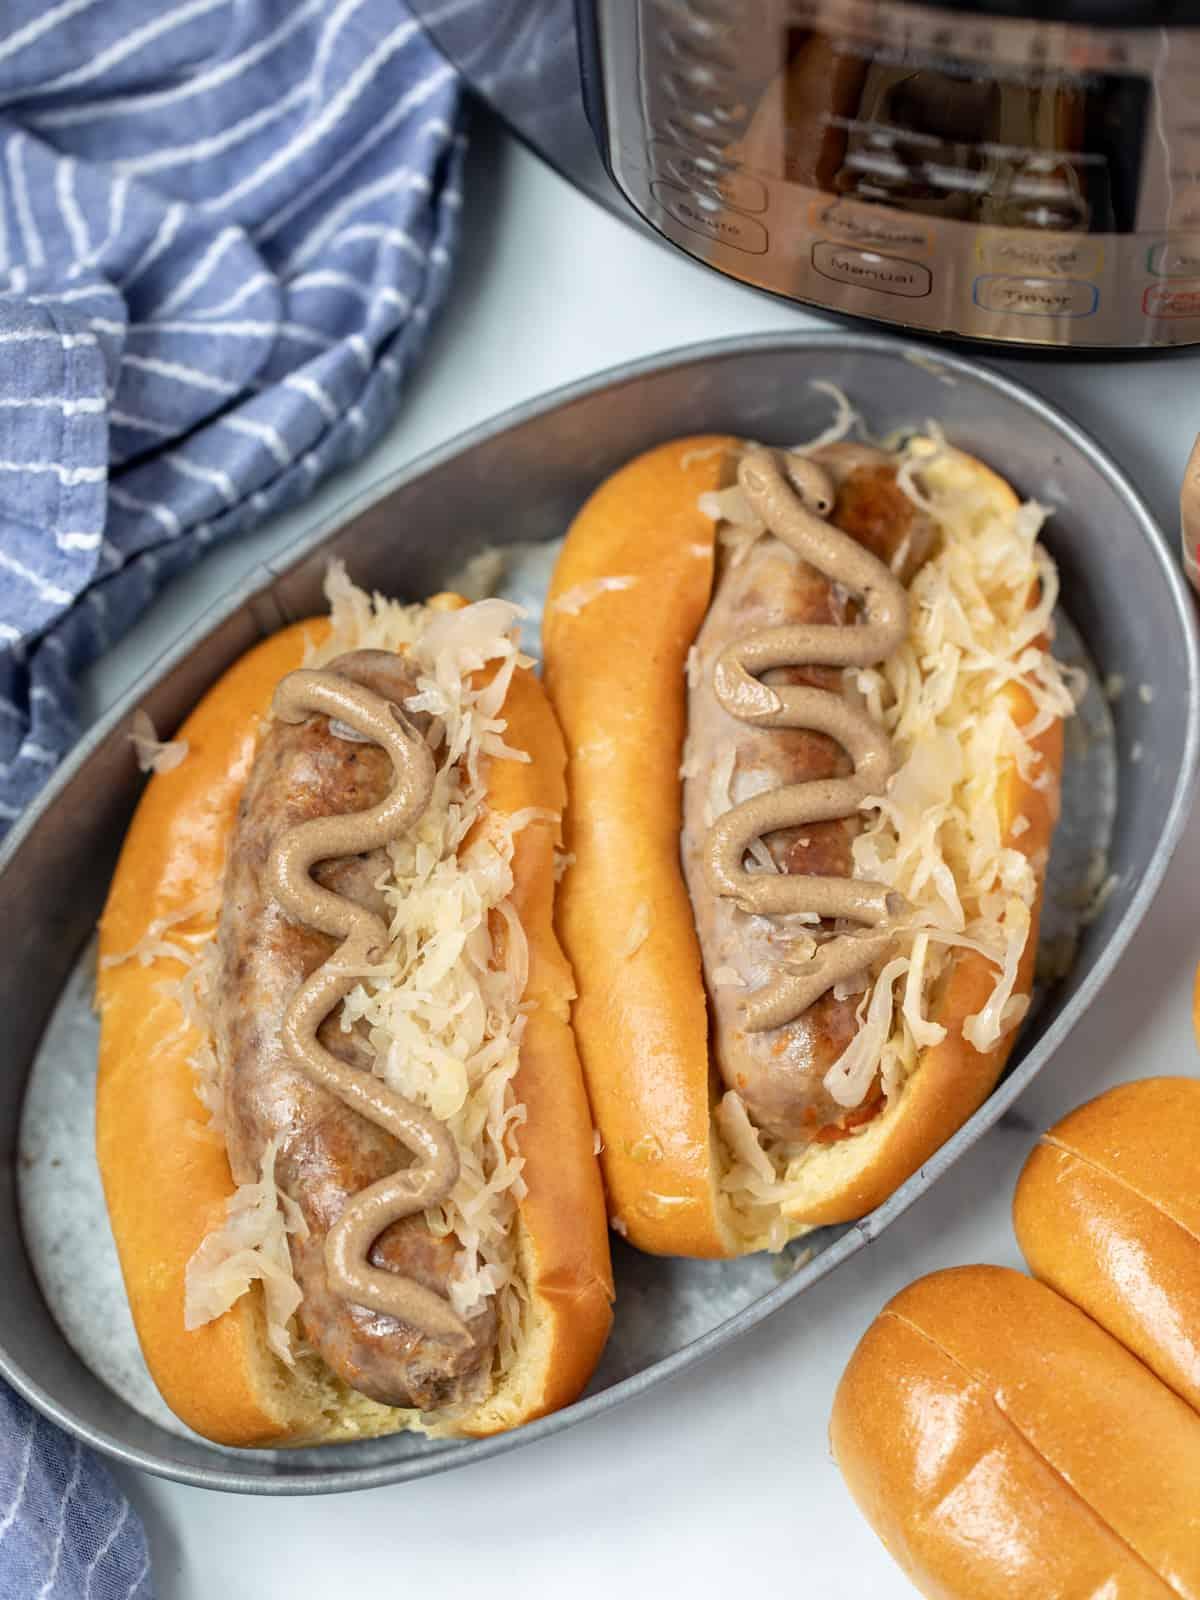 2 brats in bun with mustard and sauerkraut next to instant pot.